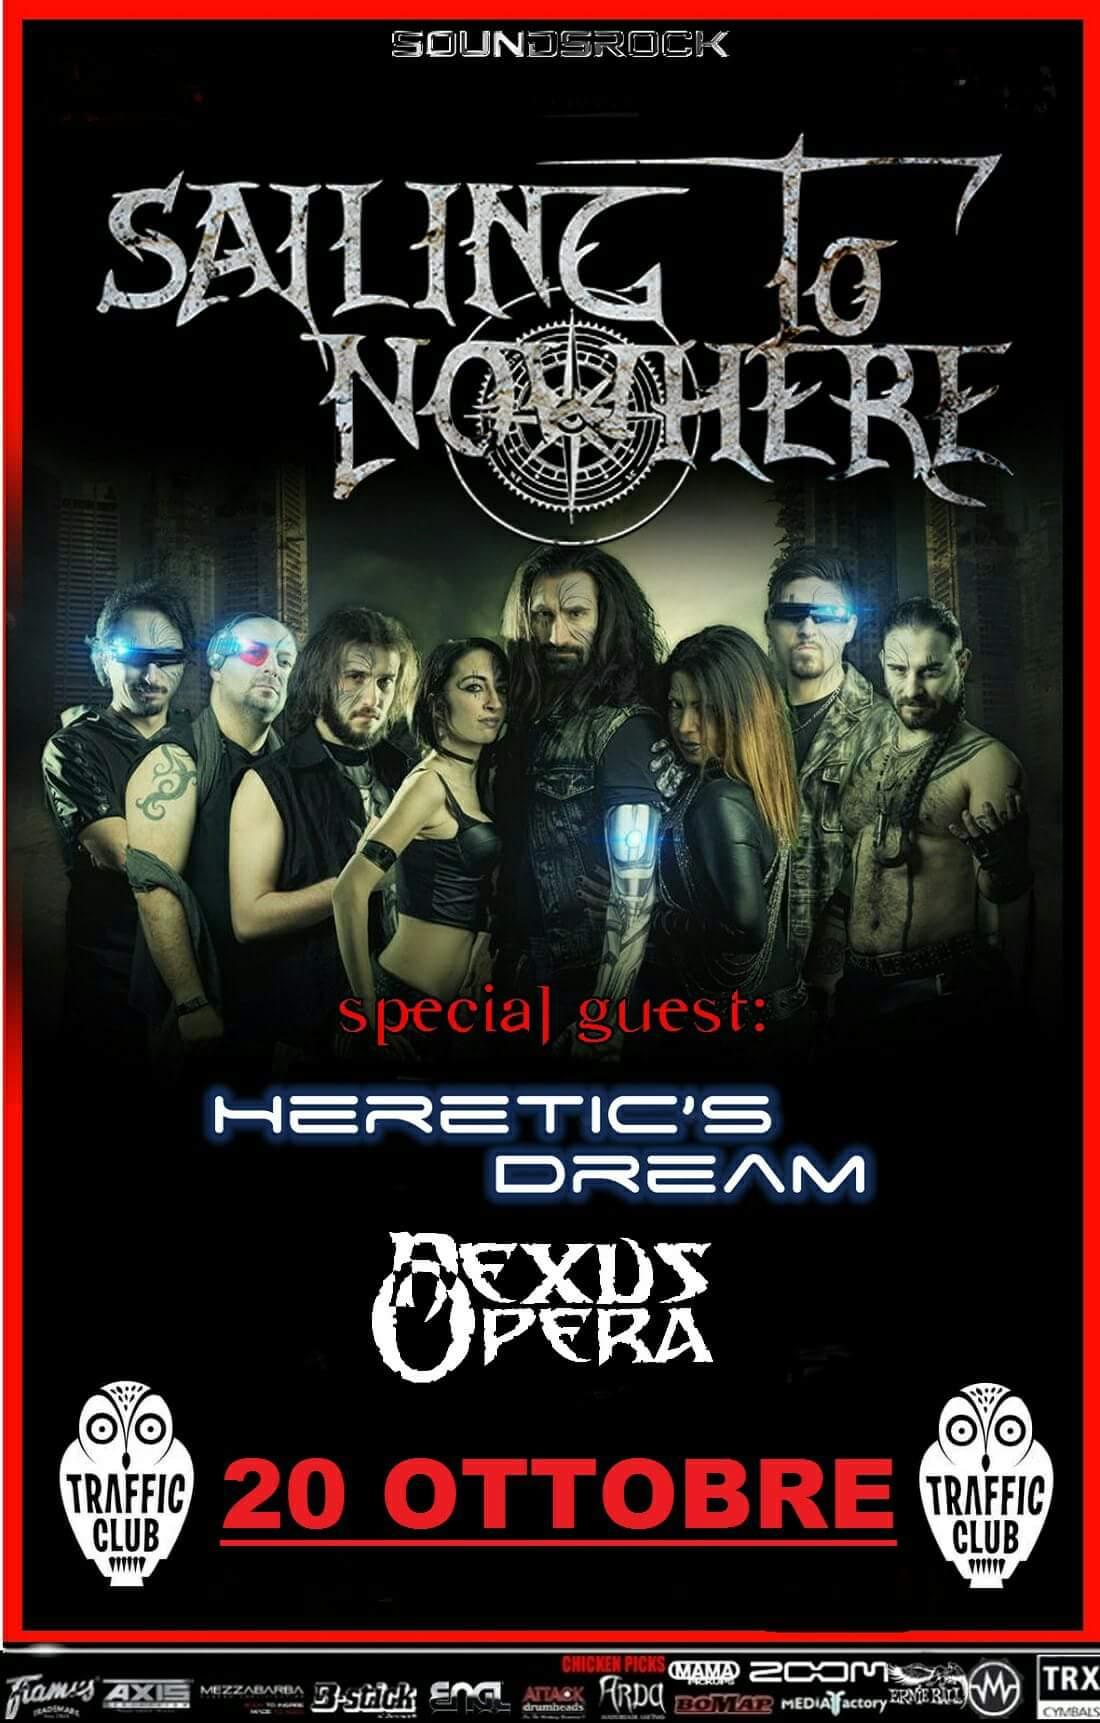 Sailing To Nowhere - Heretic's Dream - Nexus Opera - Traffic Live - Tour 2017 - Promo